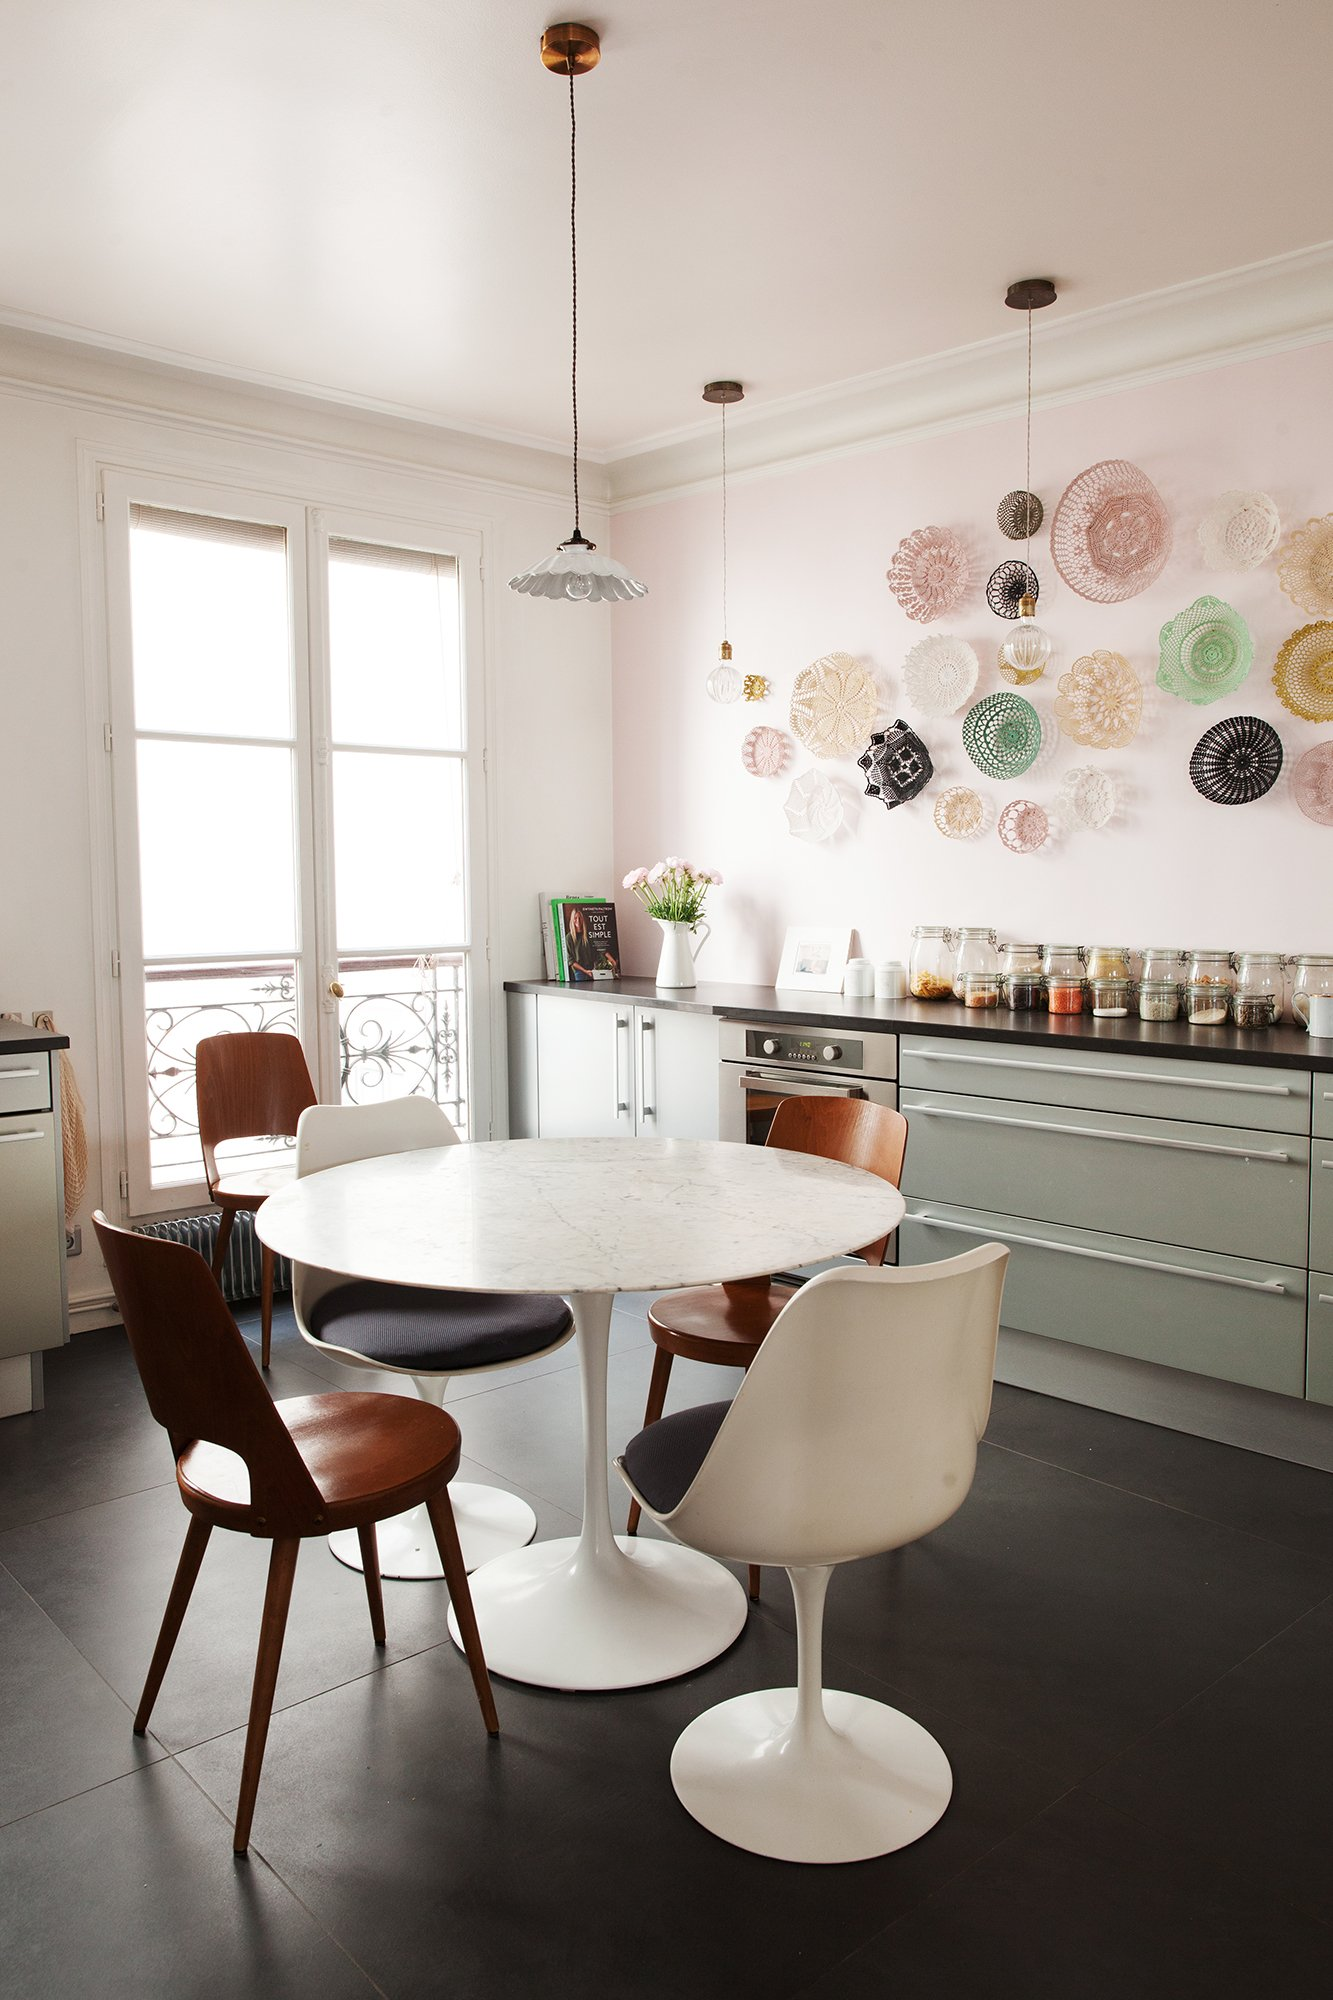 Cuisine Ensemble Saarinen Appartement Duplex Paris Nayla Voillemot et Romain